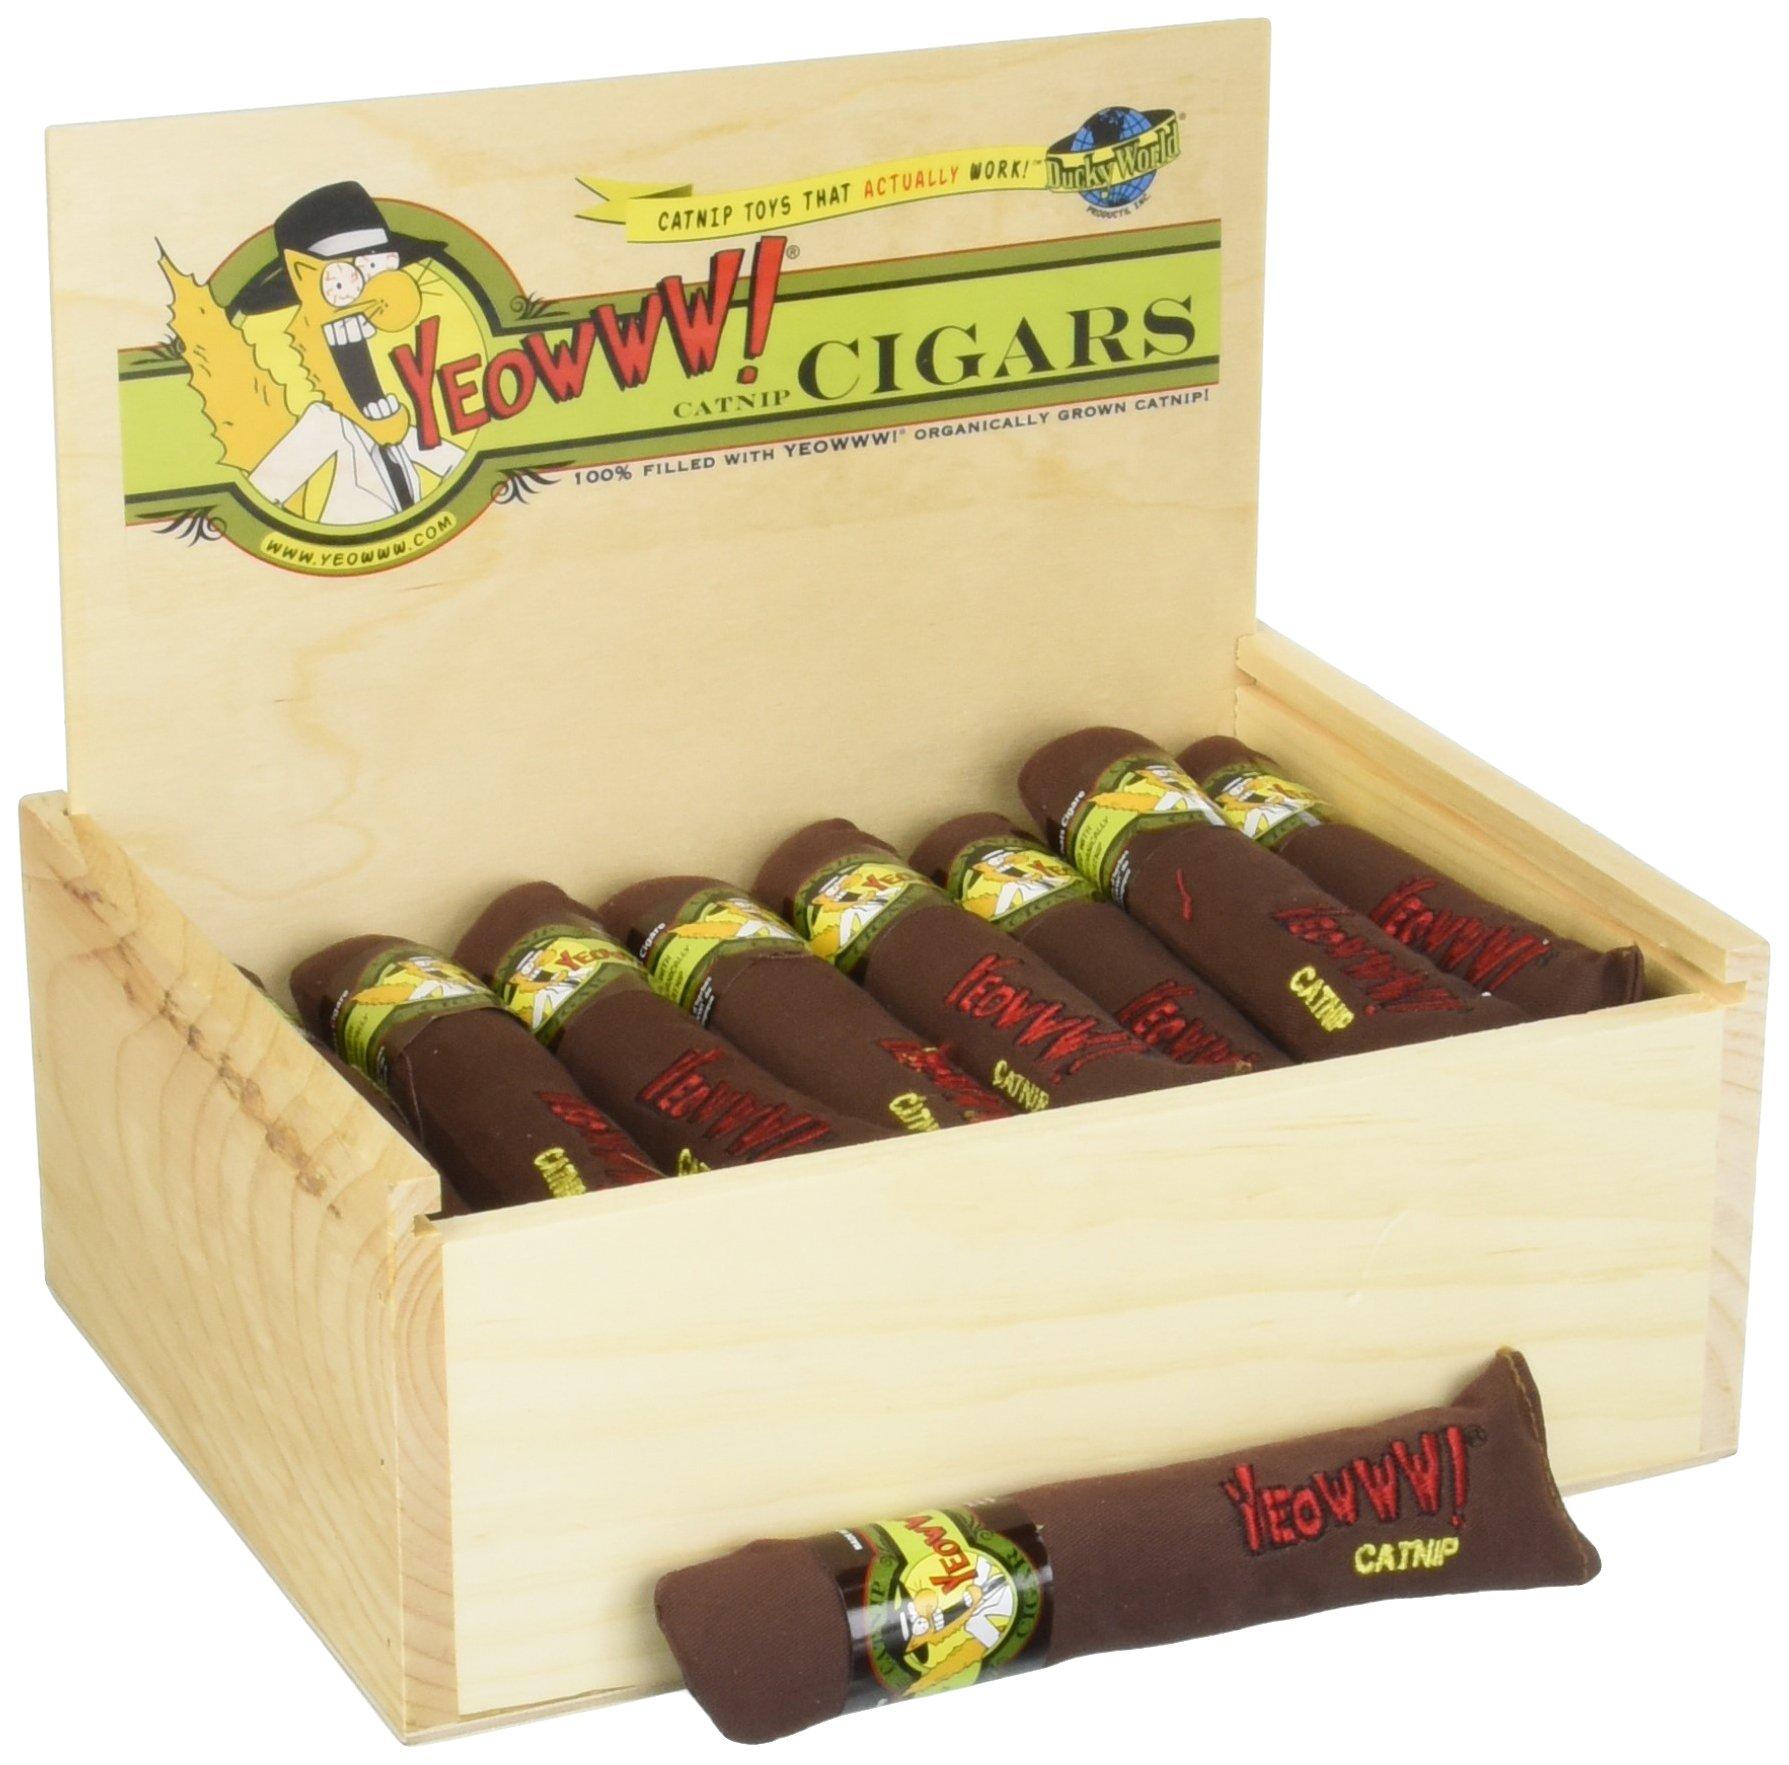 Yeowww! Catnip Cigars Box 24 count